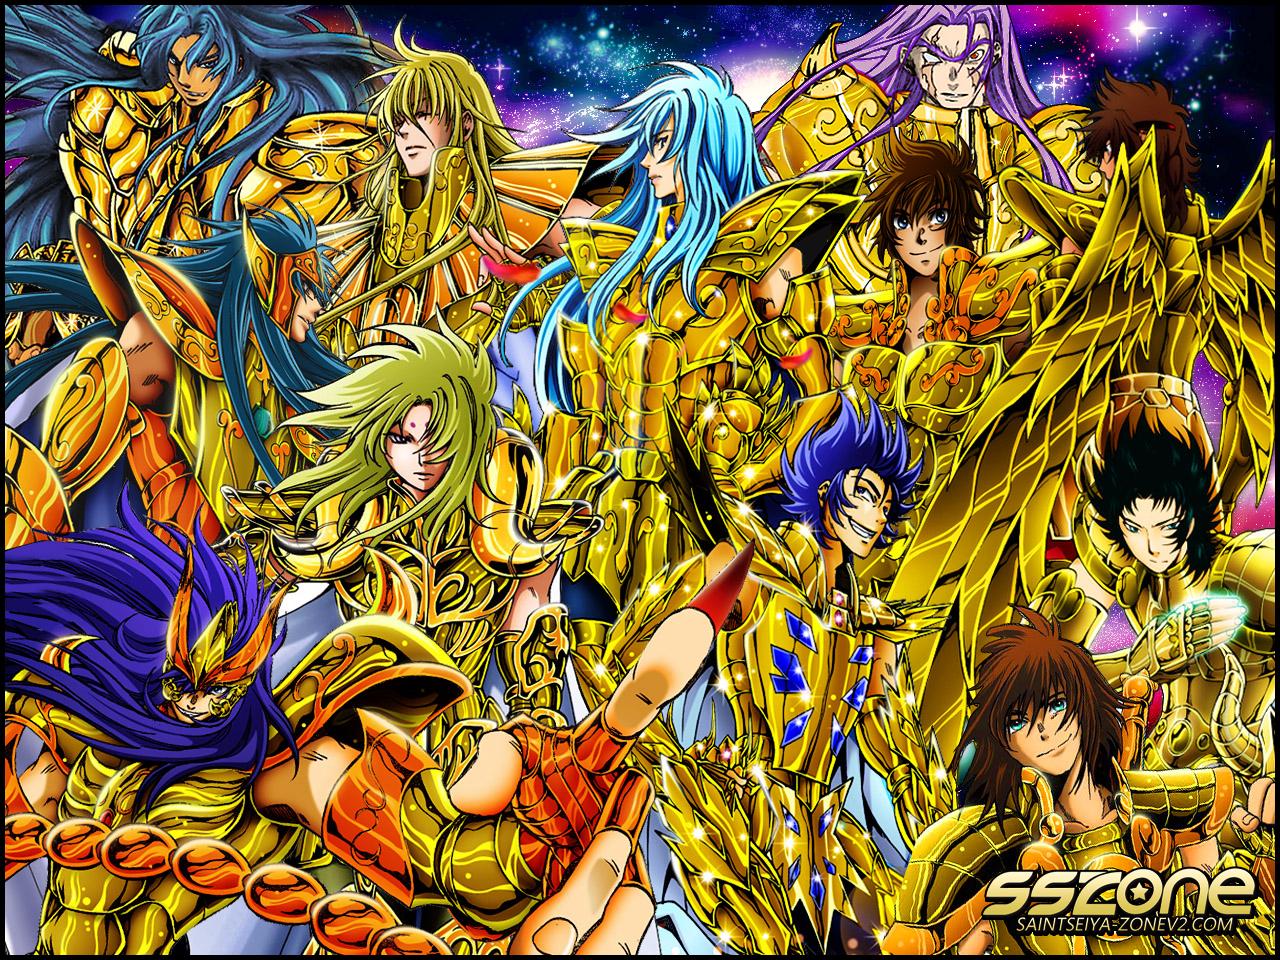 Gemini Defteros Saint Seiya Lost Canvas Zerochan Anime Image Board